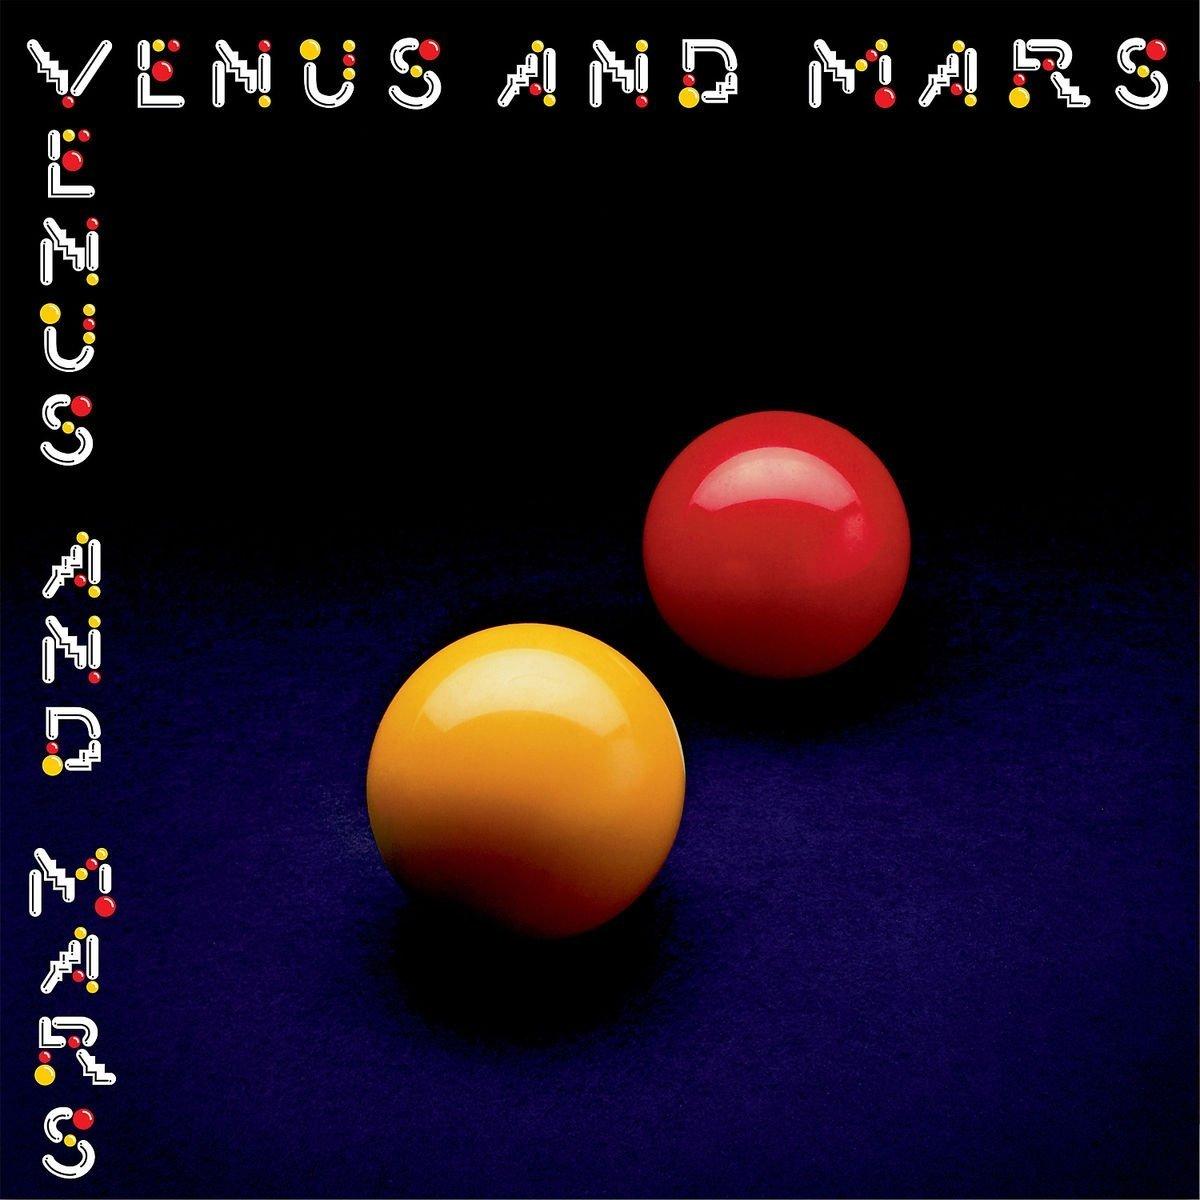 PAUL MCCARTNEY - VENUS AND MARS (CD)